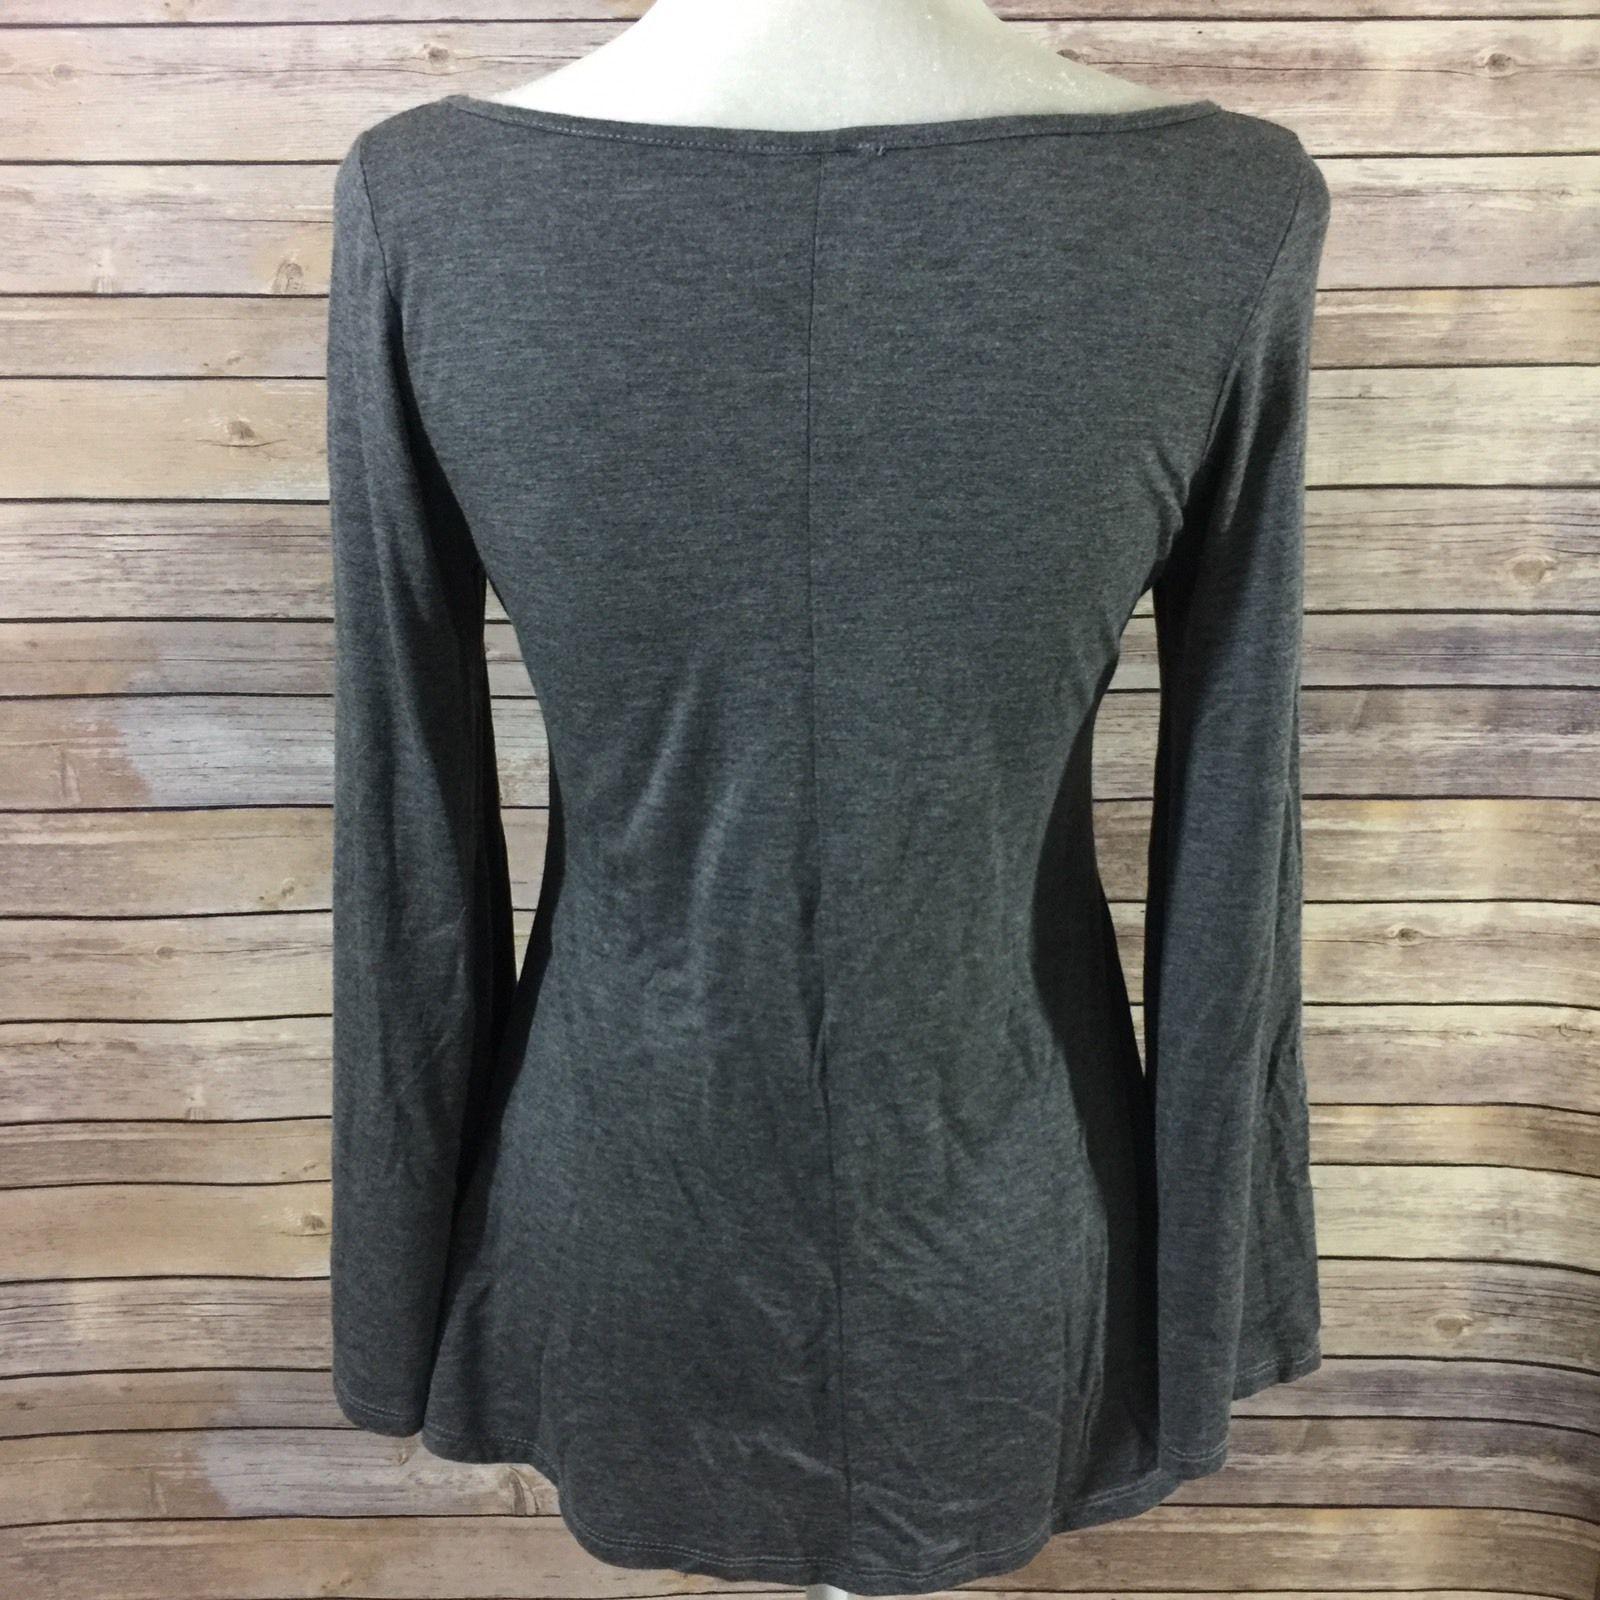 Heshe womenus small knit top gray bell long sleeve shirt fit u flare